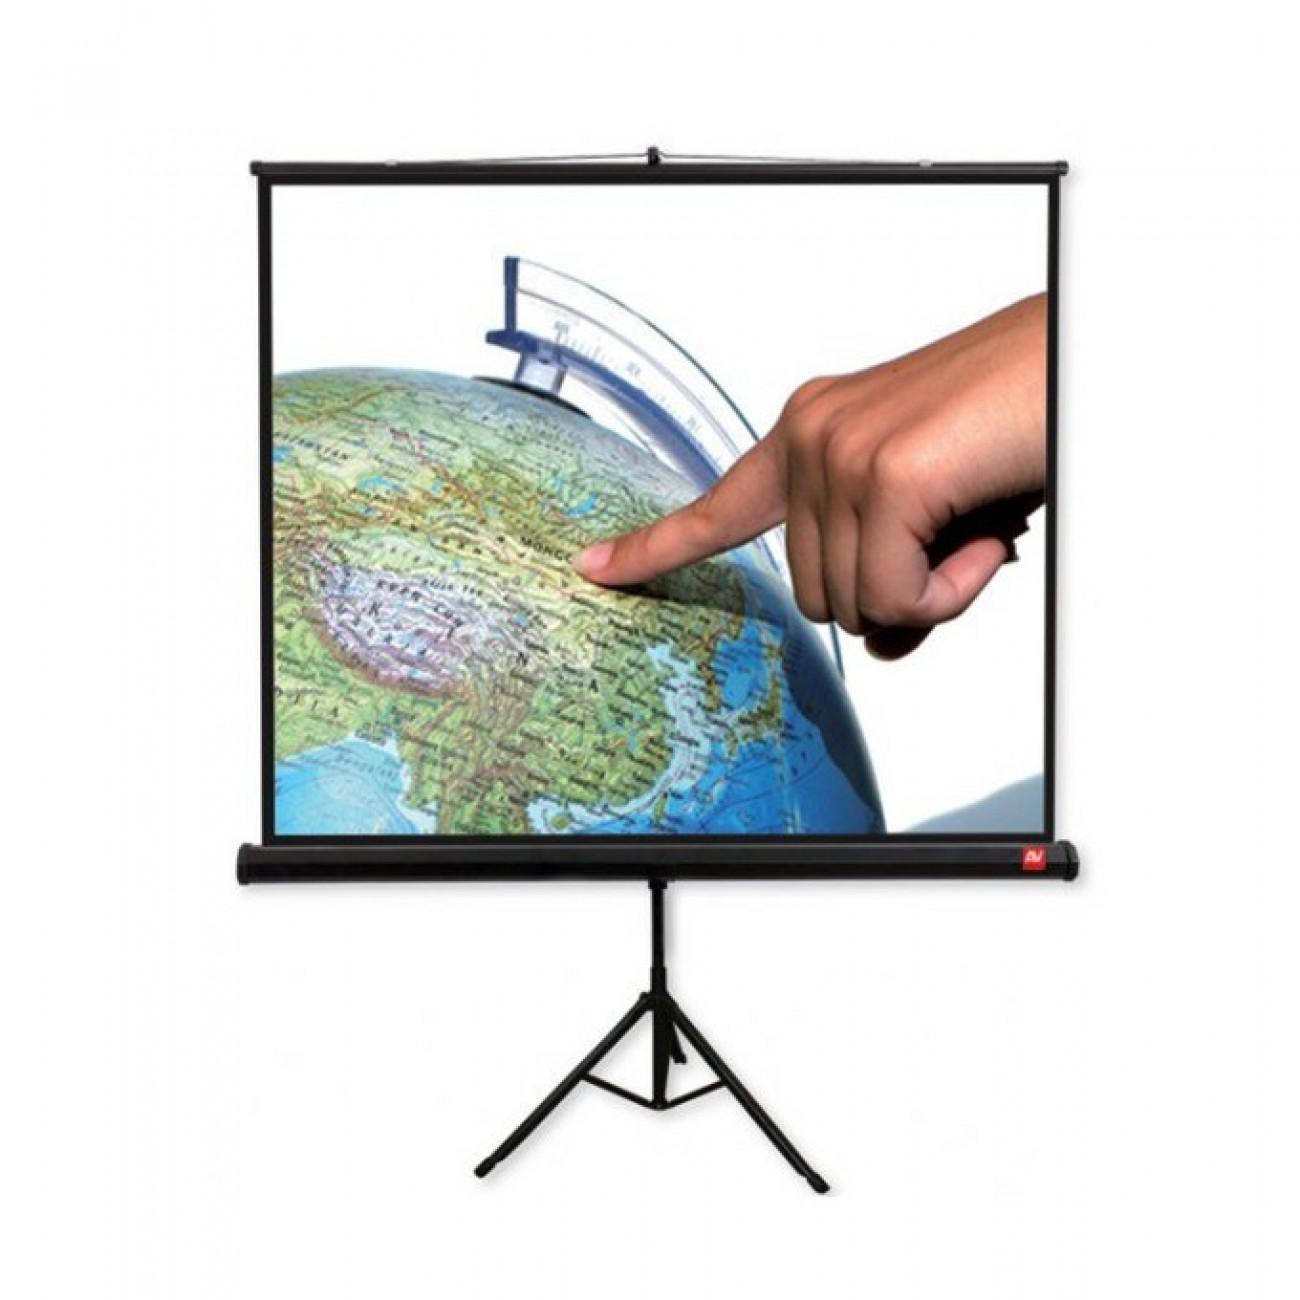 Екран Avtek Tripod Standard 200, преносим сгъваем трипод, Matt White, 200х200см, 111, 1:1, универсален в Екрани за проектори -    Alleop